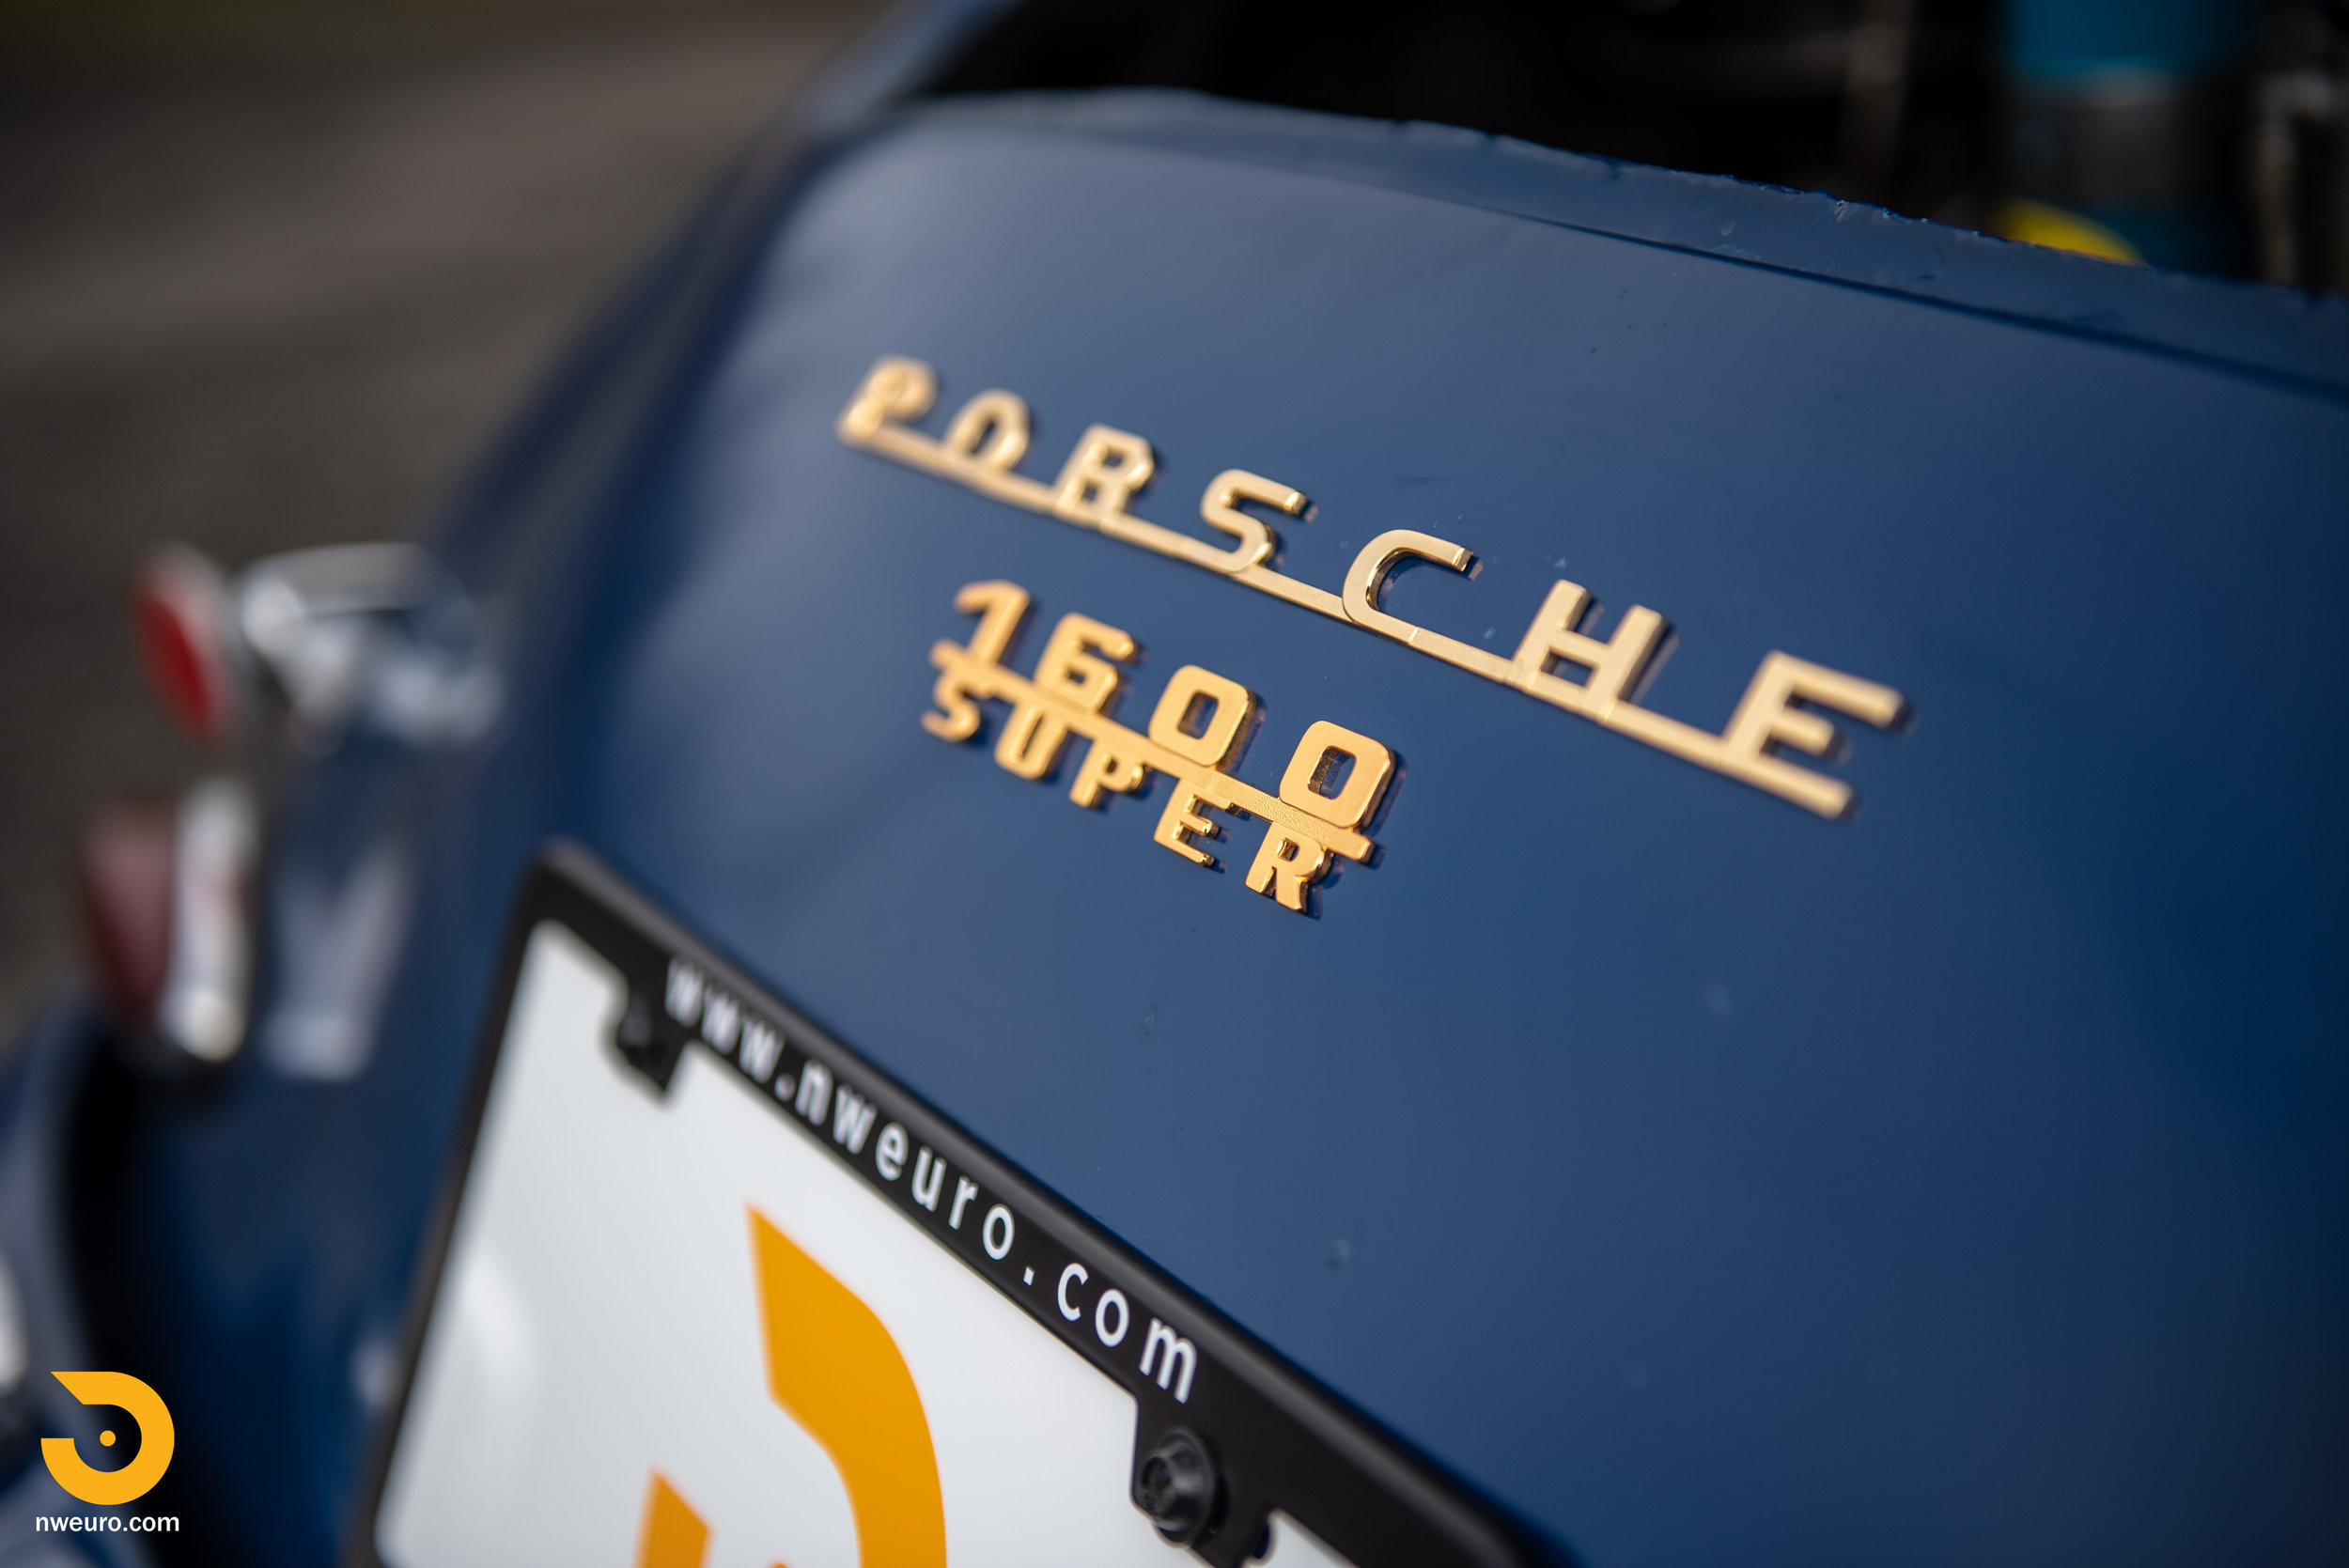 1960 Porsche 356 Hardtop Cab 1600 Super-59.jpg